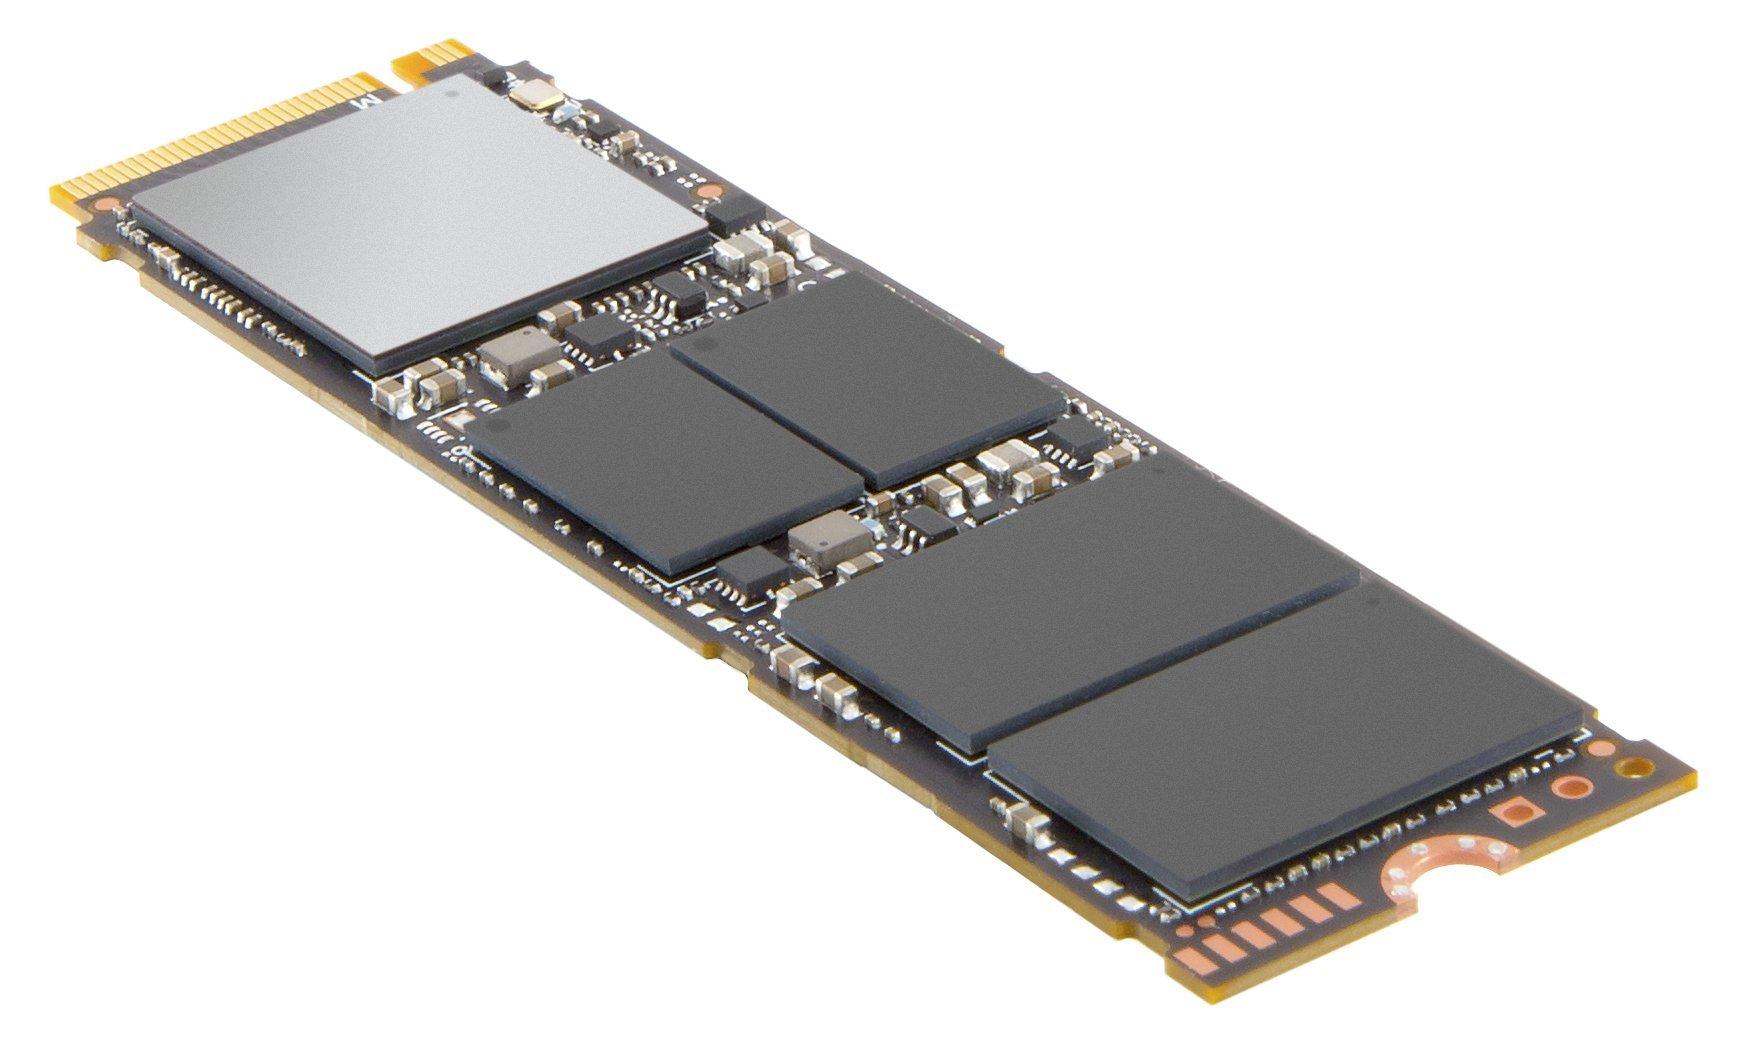 Intel SSD 760P Series (512GB, M.2 80mm PCIe 3.0 x4, 3D2, TLC) by Intel (Image #5)